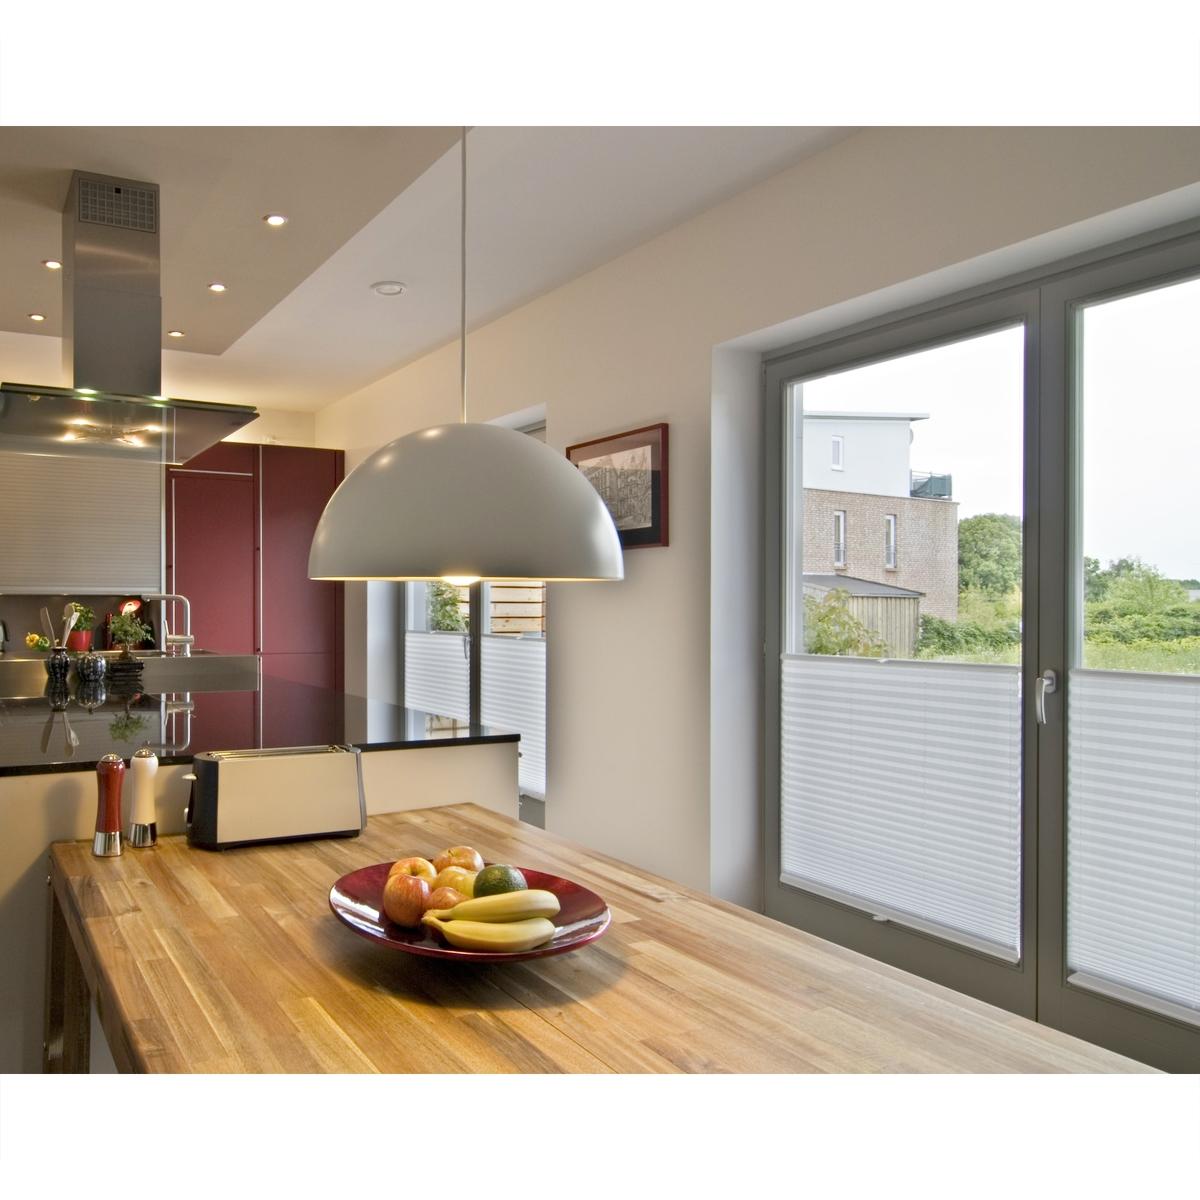 verdunkelungsrollo seitenzugrollo doppelrollo plissee klemmfix ohne bohren rollo ebay. Black Bedroom Furniture Sets. Home Design Ideas